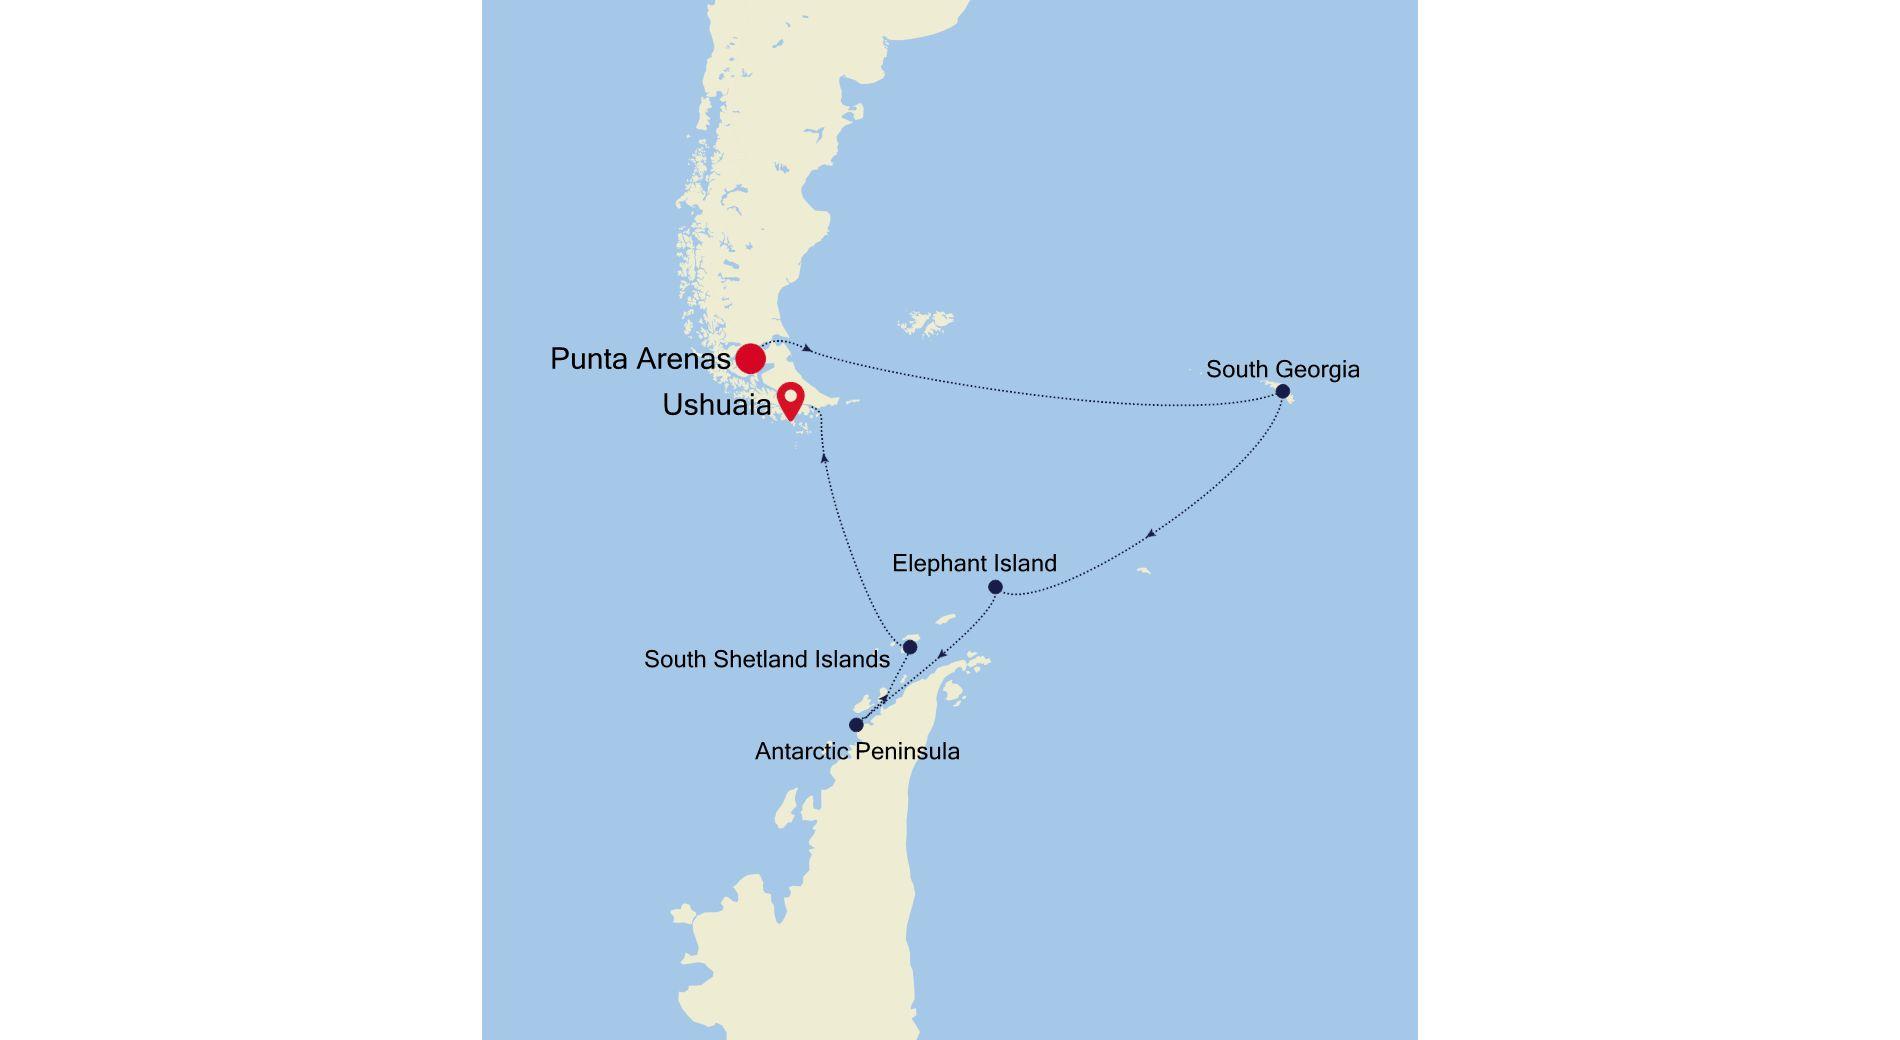 E4211114016 - Punta Arenas a Ushuaia